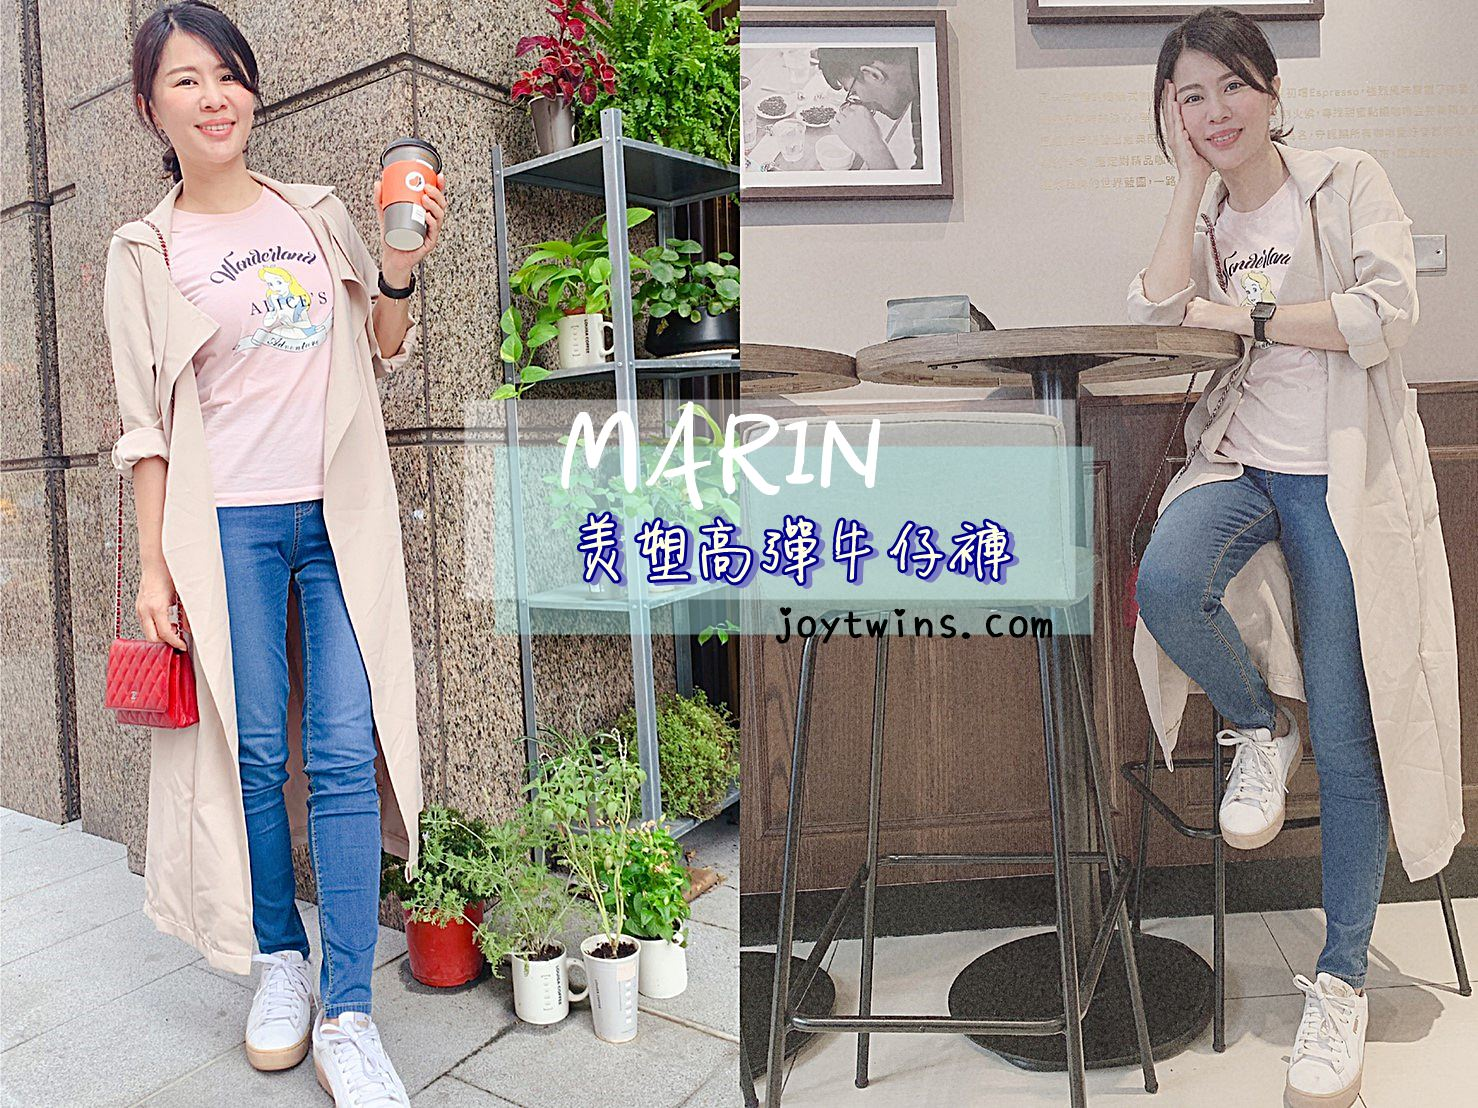 MARIN美塑高彈牛仔褲 讓你輕鬆在夏天腿長、屁股翹 肚肉不外溢 (加碼高腰塑腹日著壓力褲)